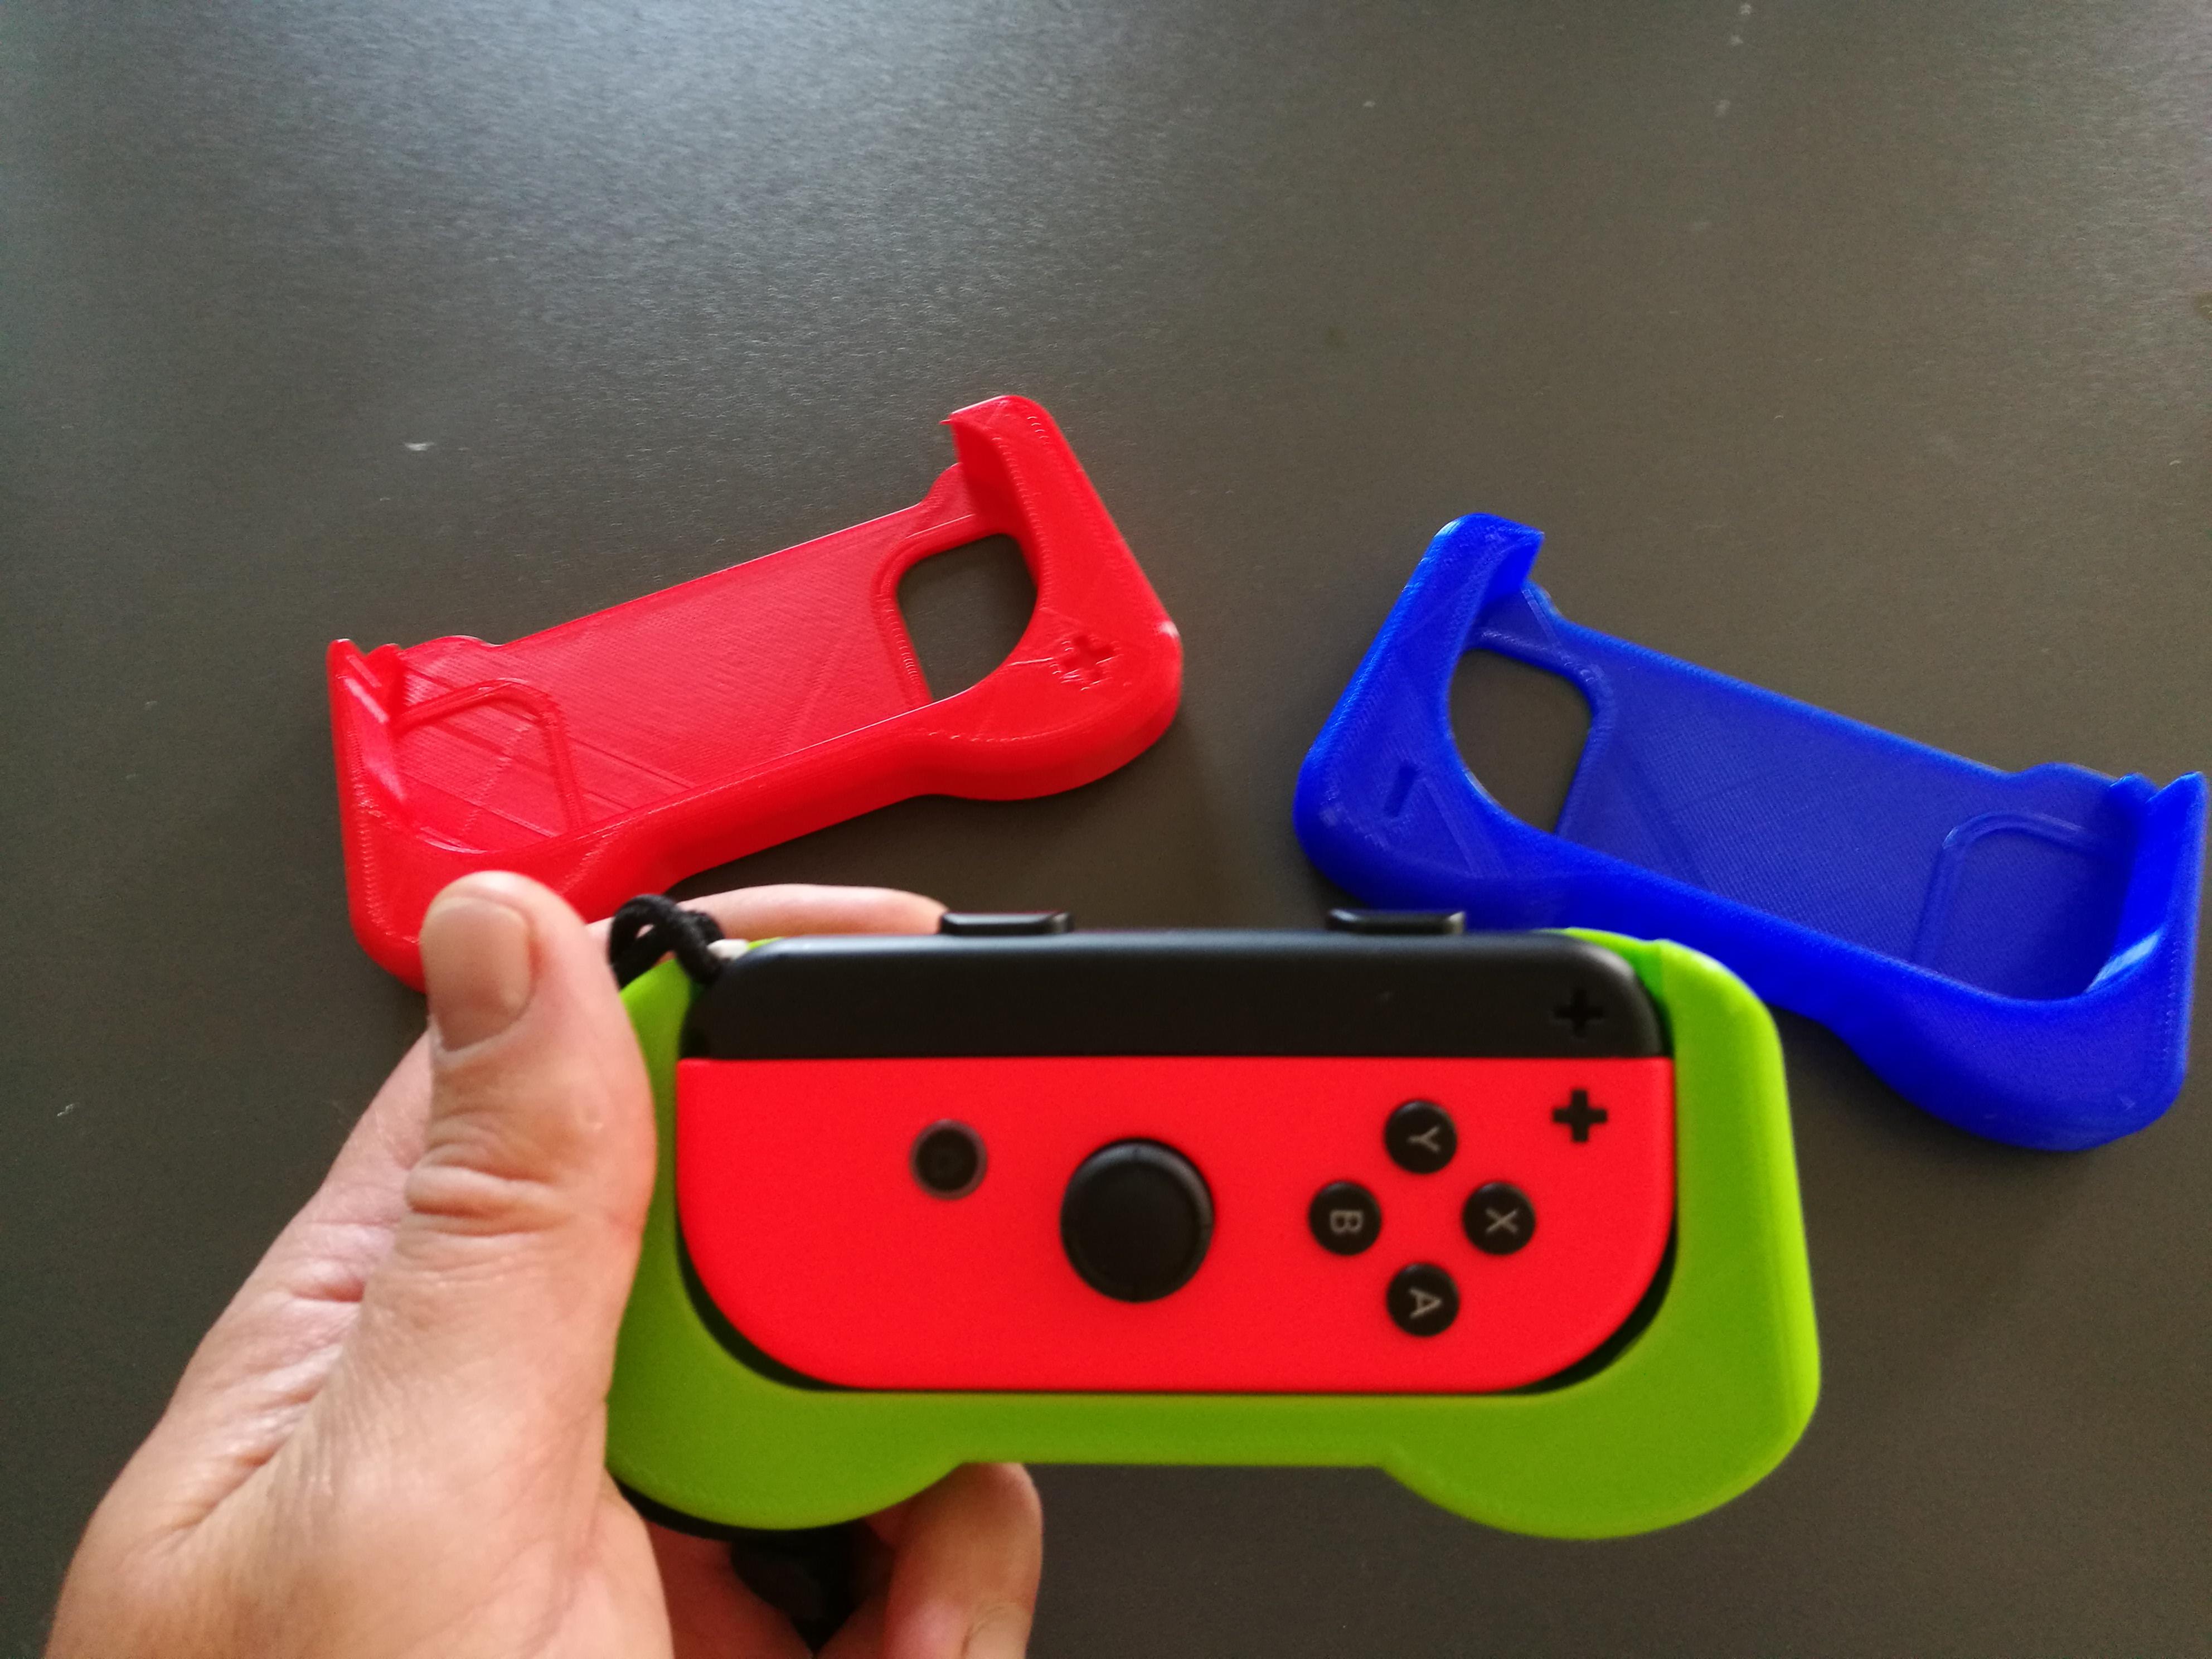 Support_JoyCon_Nintendo_Switch (4)